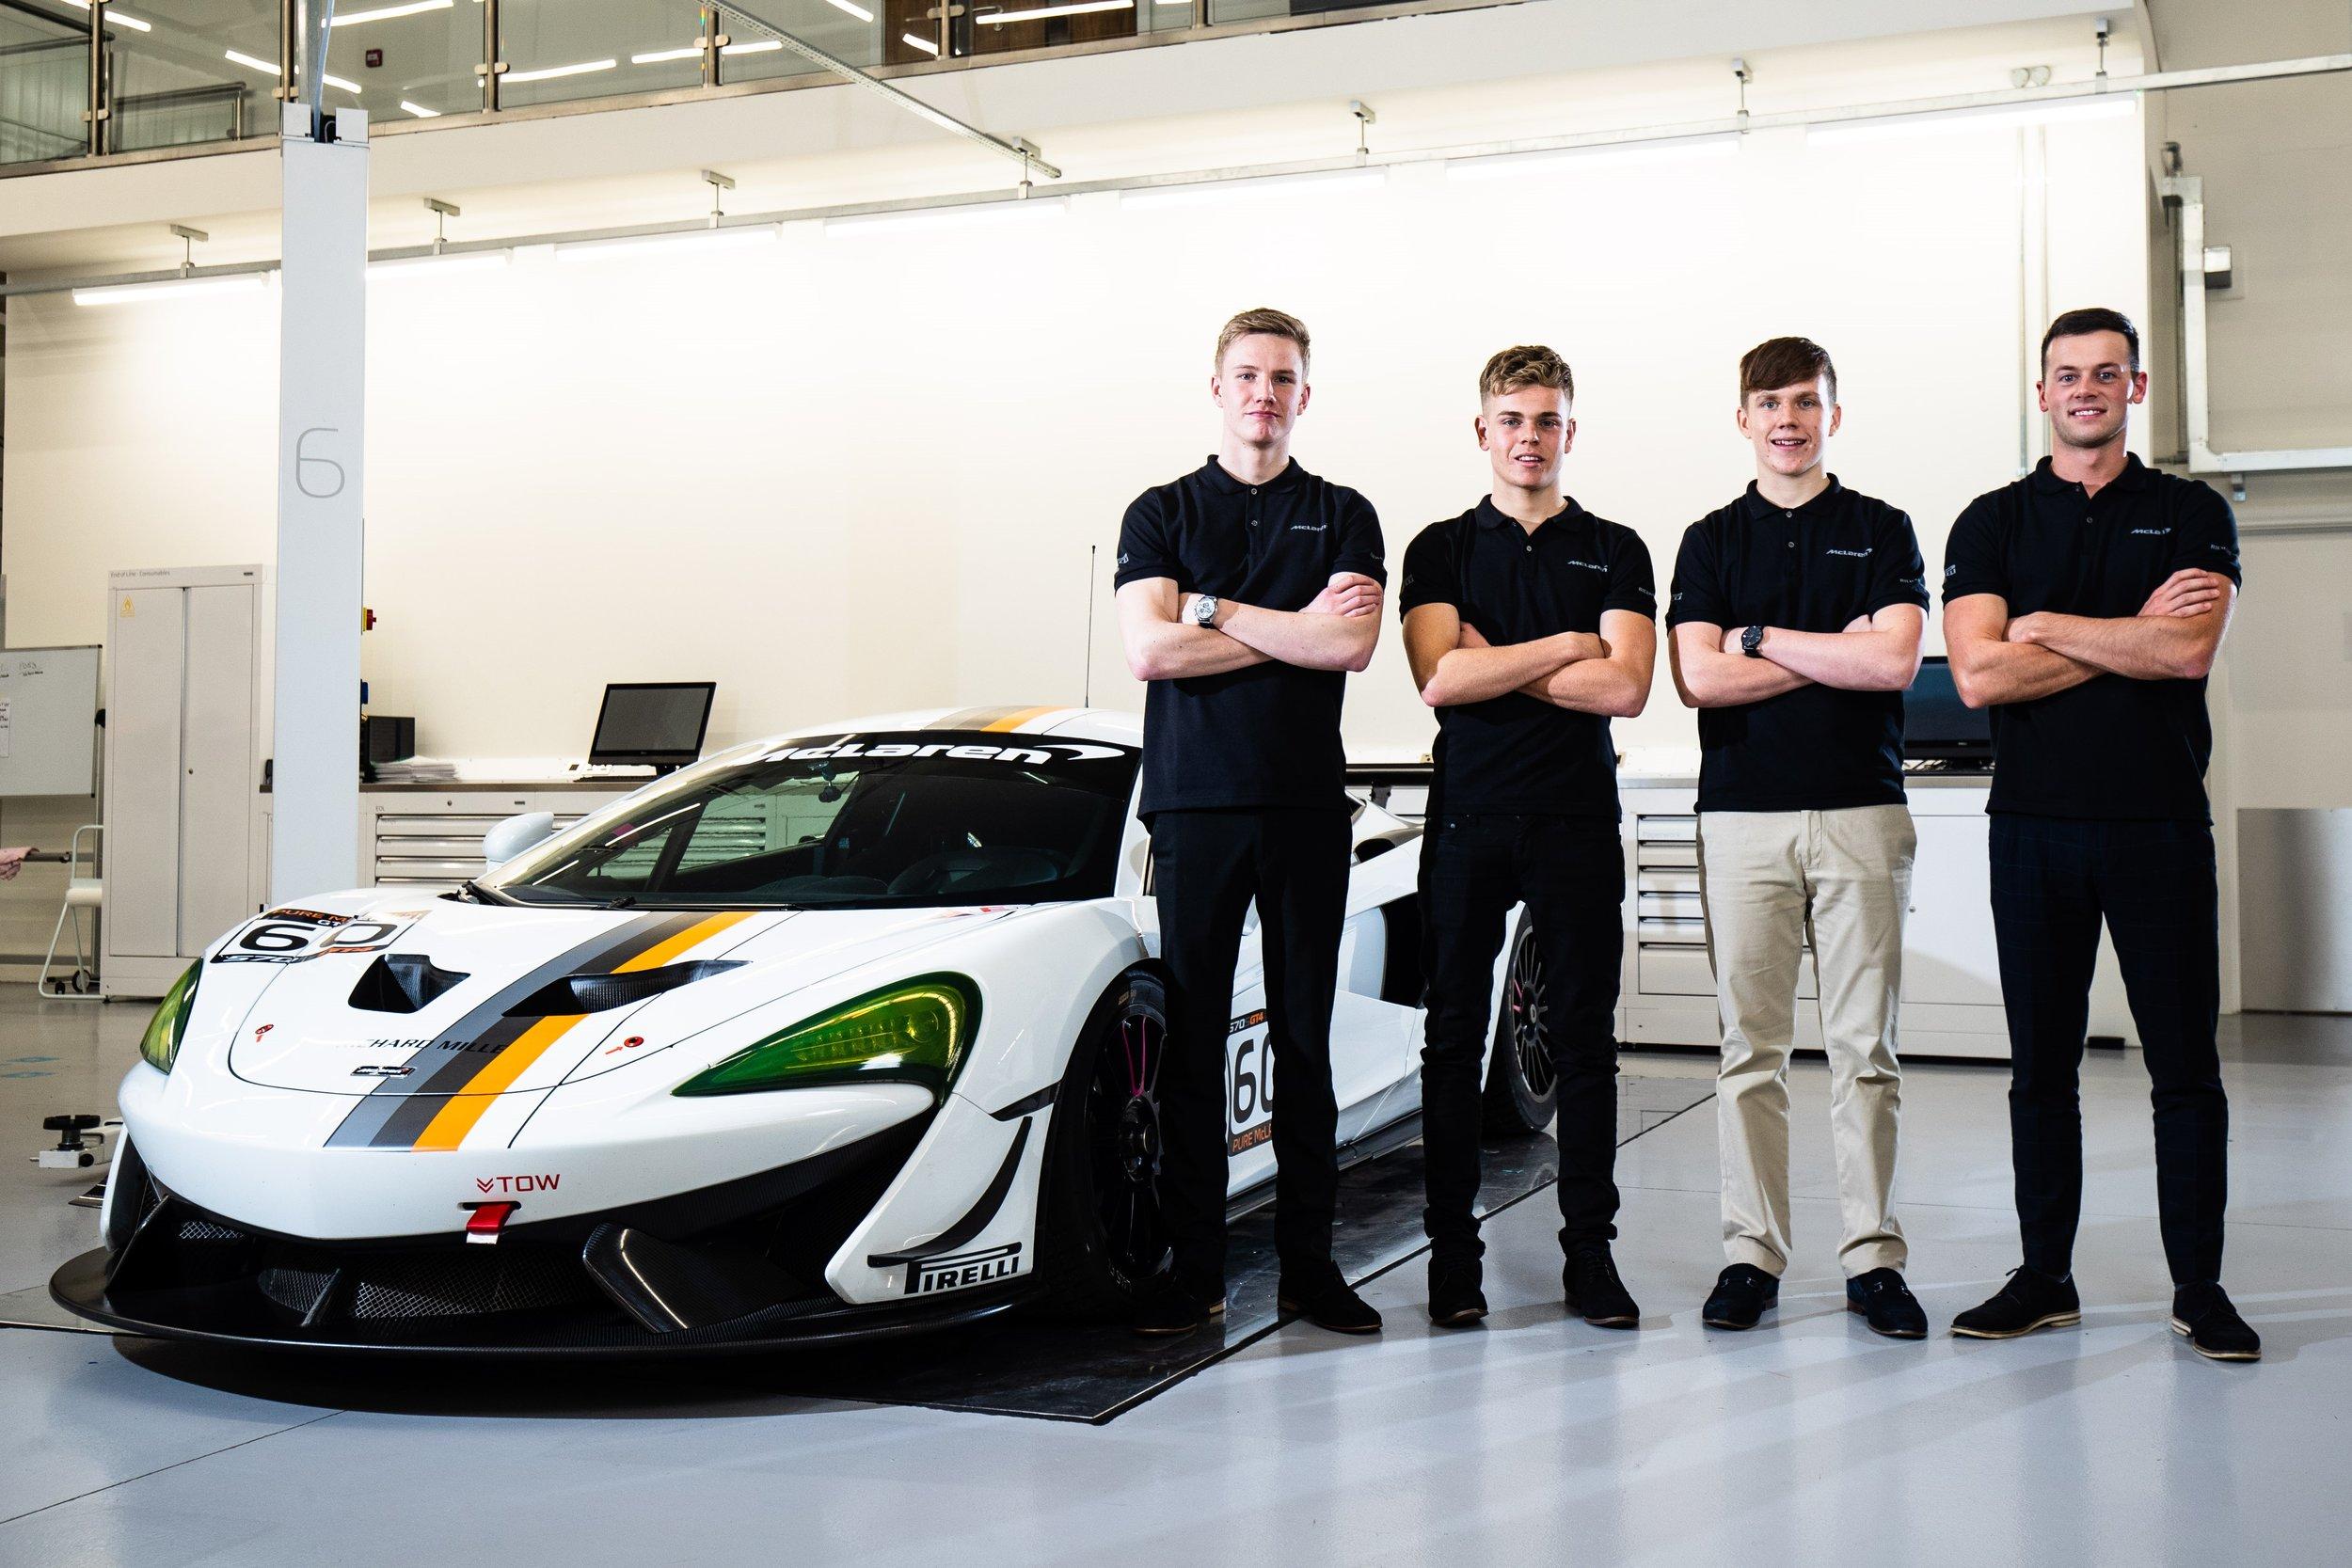 McLarenAutomotive-2019-DriverDevelopmentProgram-0117a.jpg